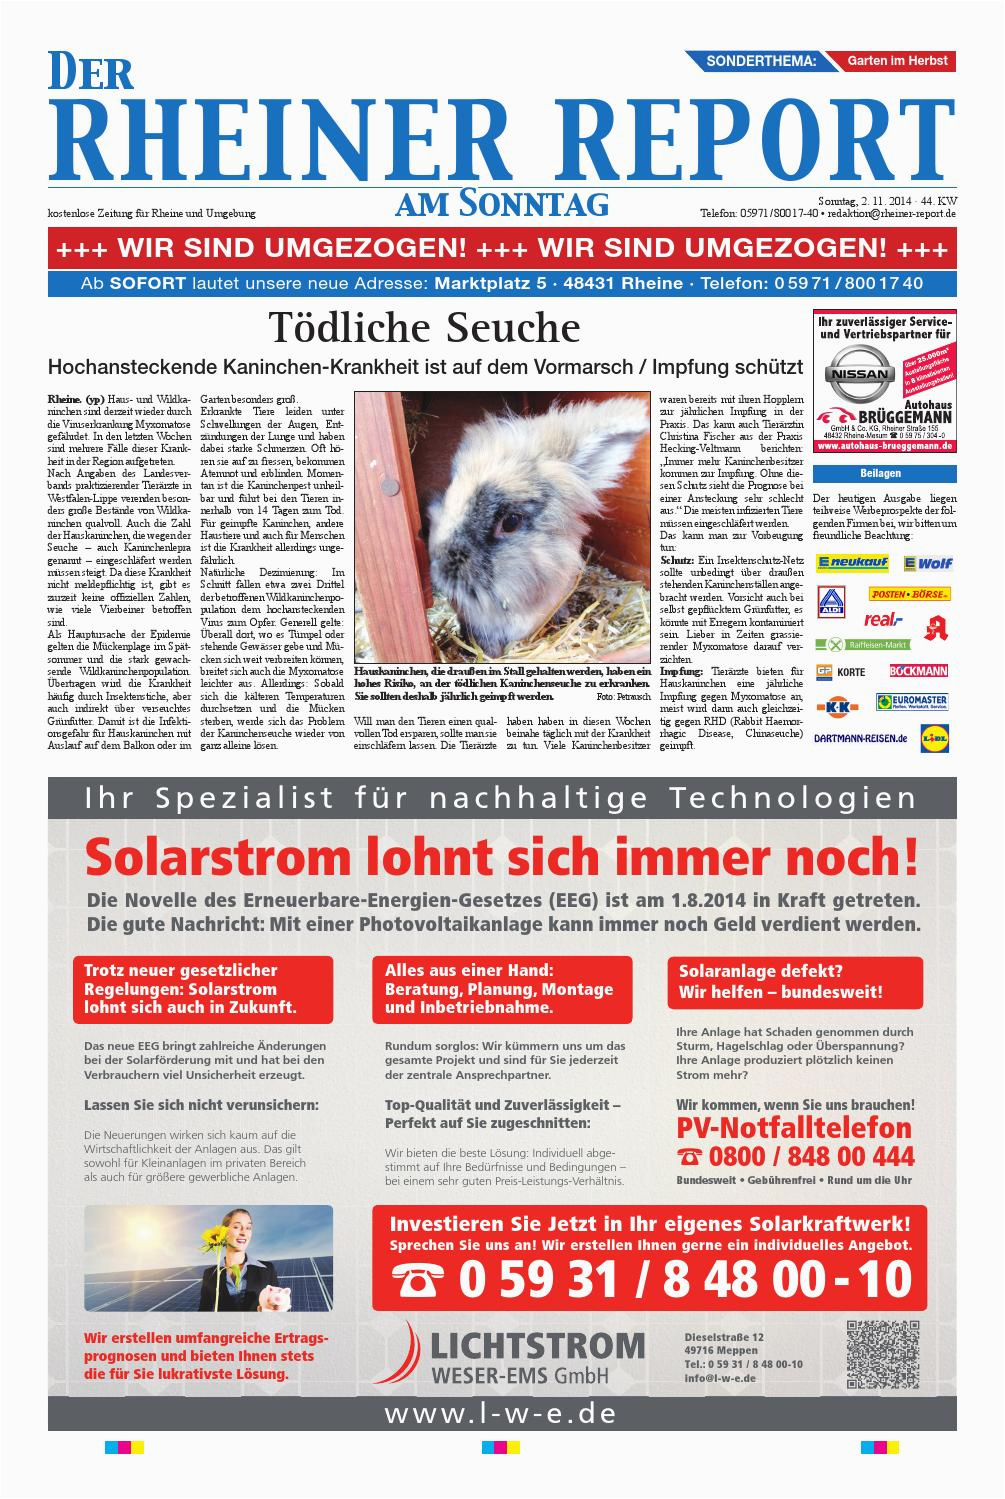 Kücheninsel Dunstabzug Kw44 2014 by Rheiner Report Gmbh issuu